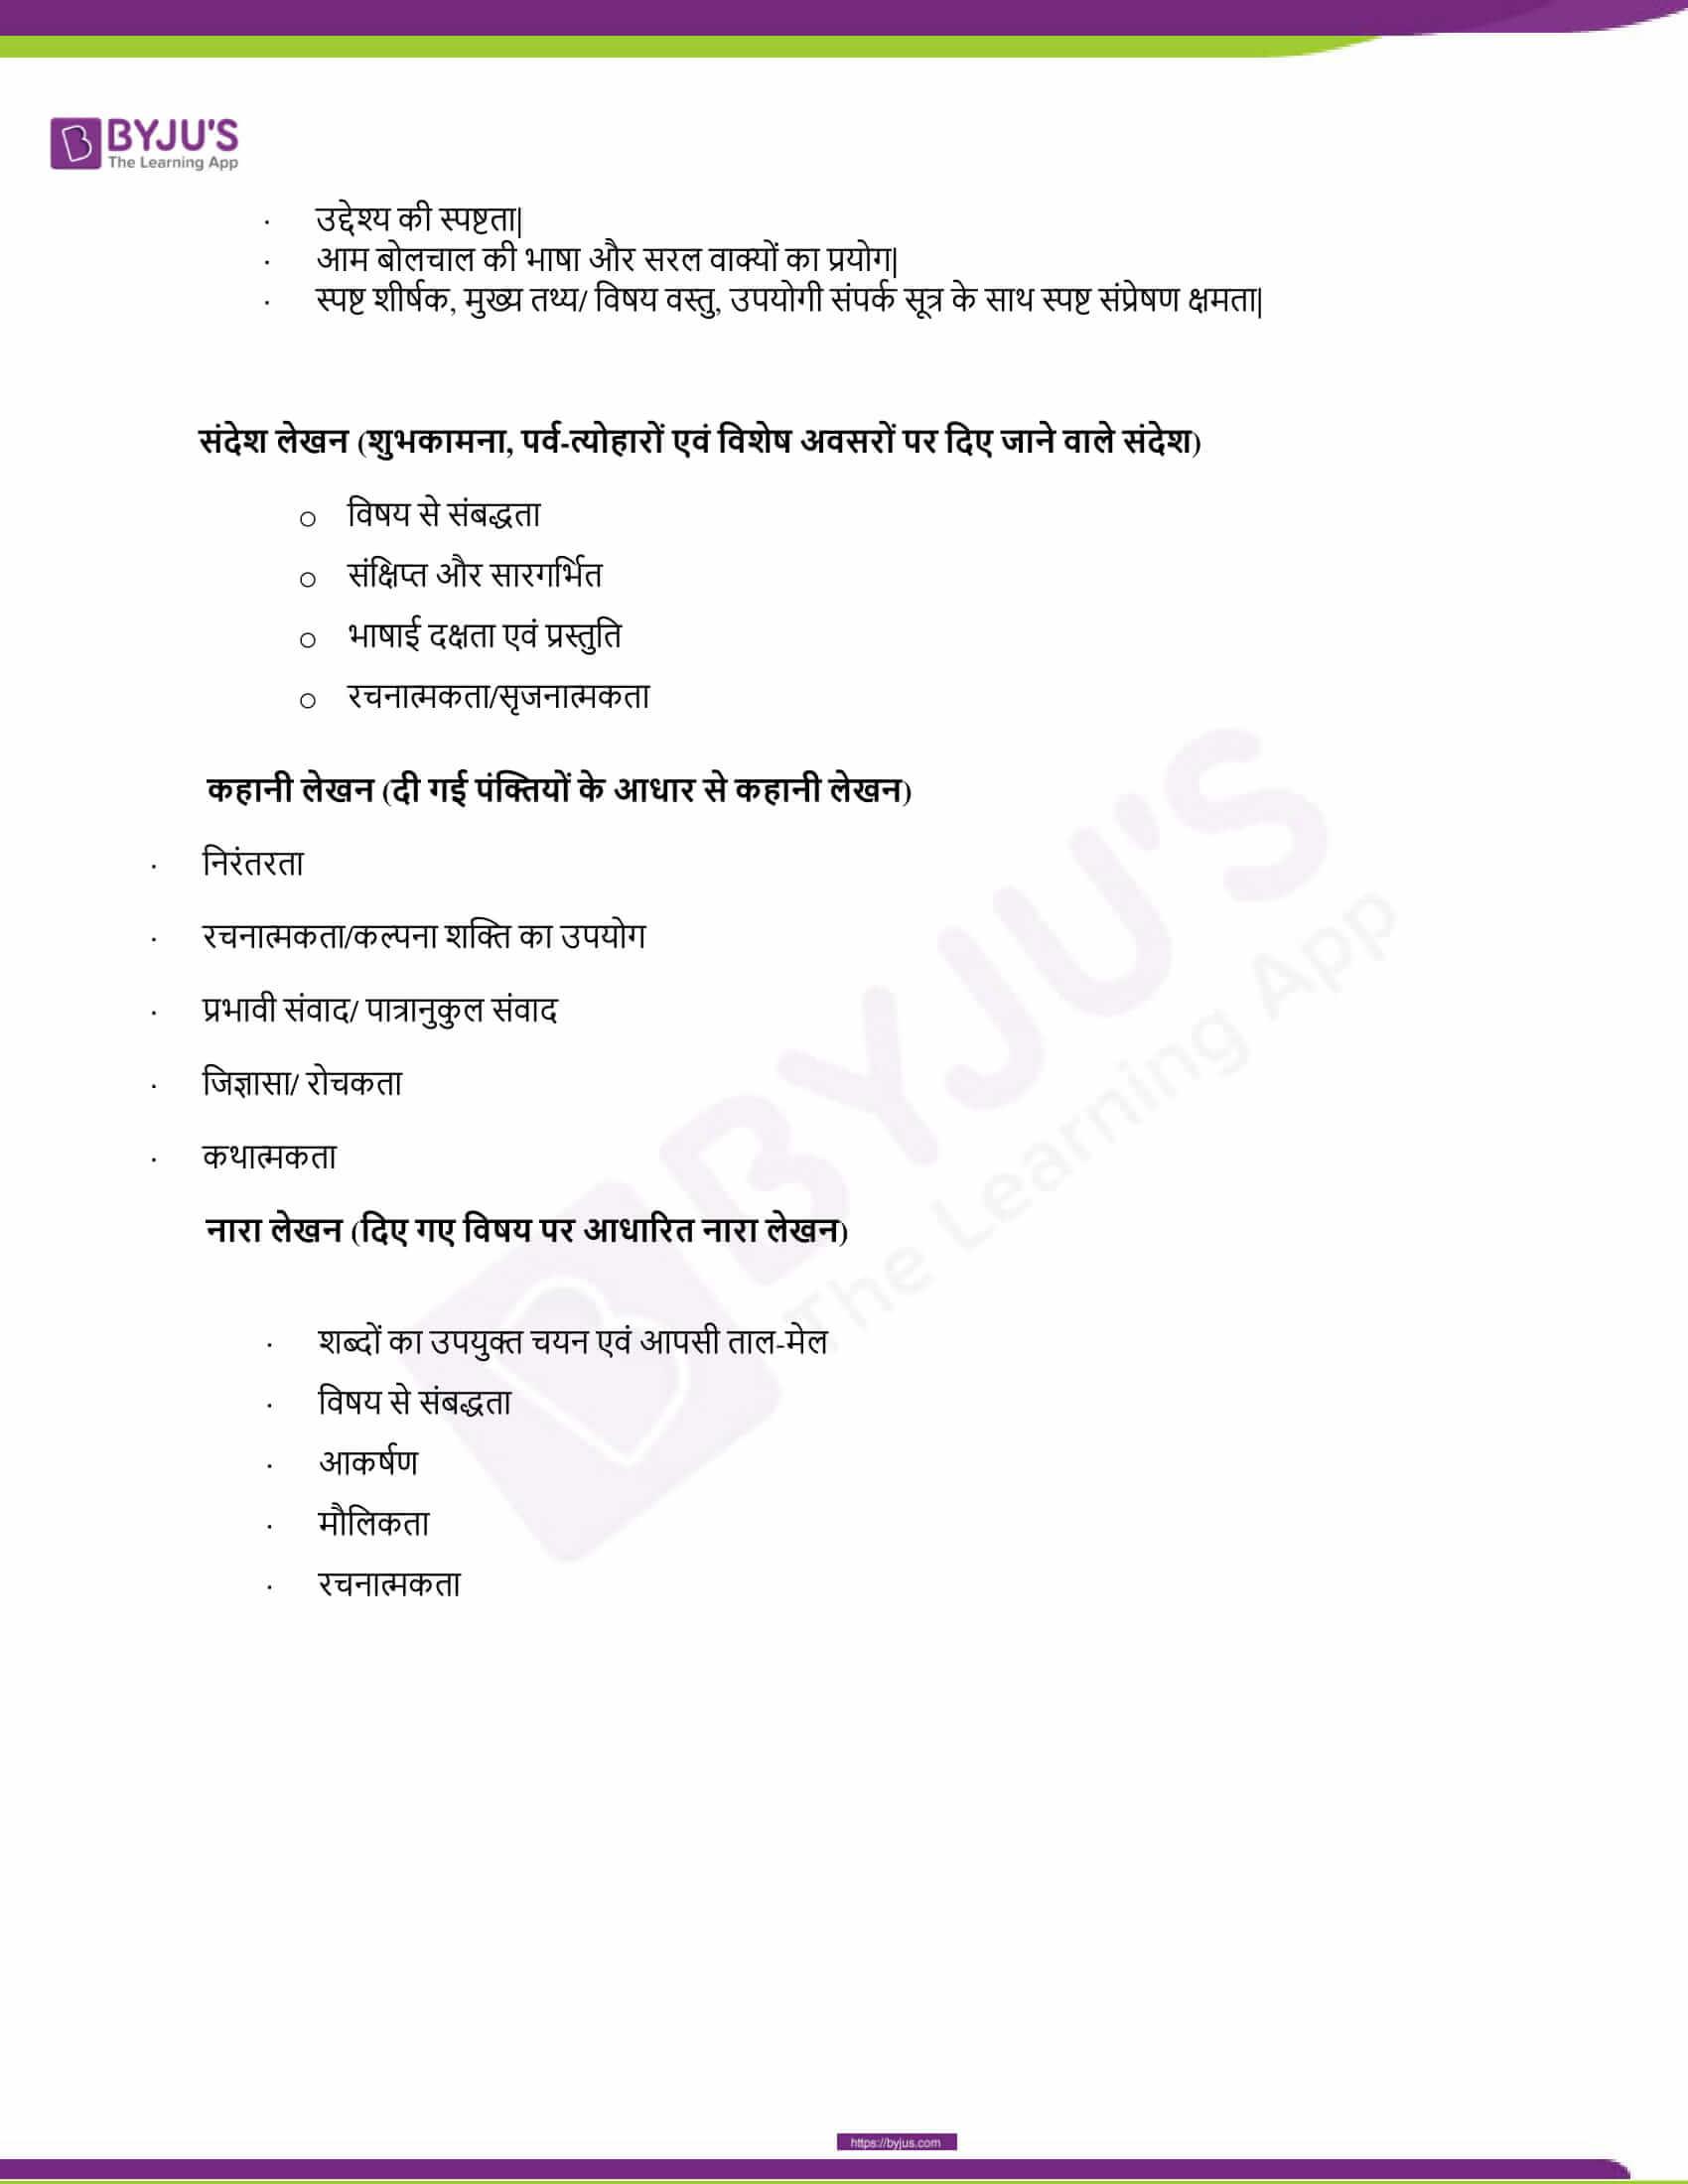 CBSE Class 10 Hindi Course B Revised Syllabus 2020 21 07